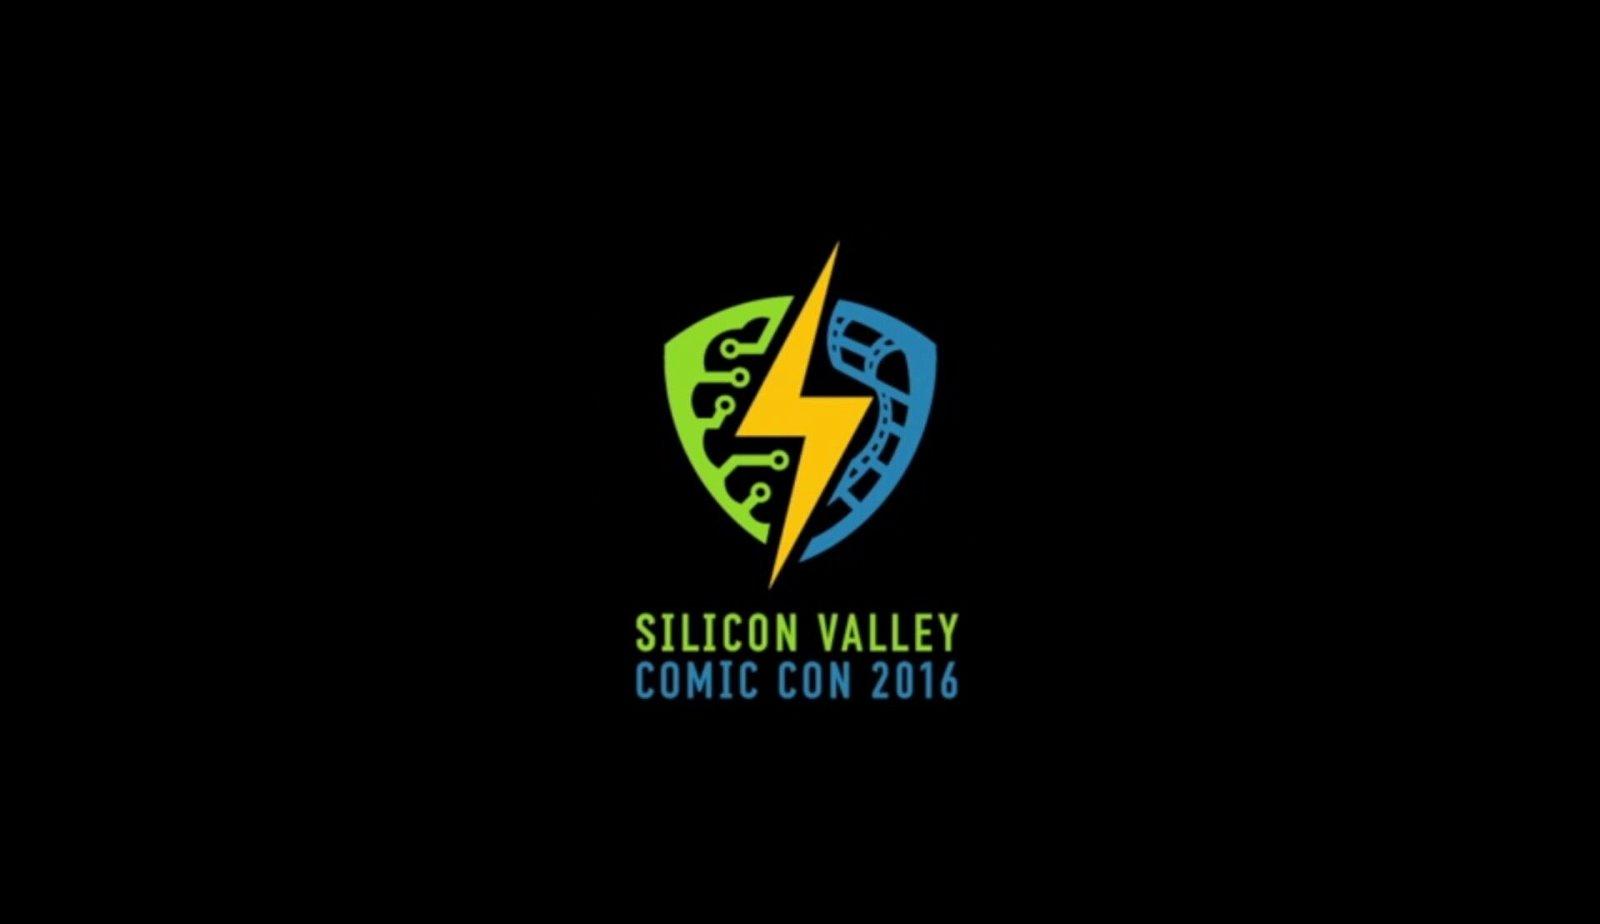 Woz and Luckey Kick off Silicon Valley Comic Con